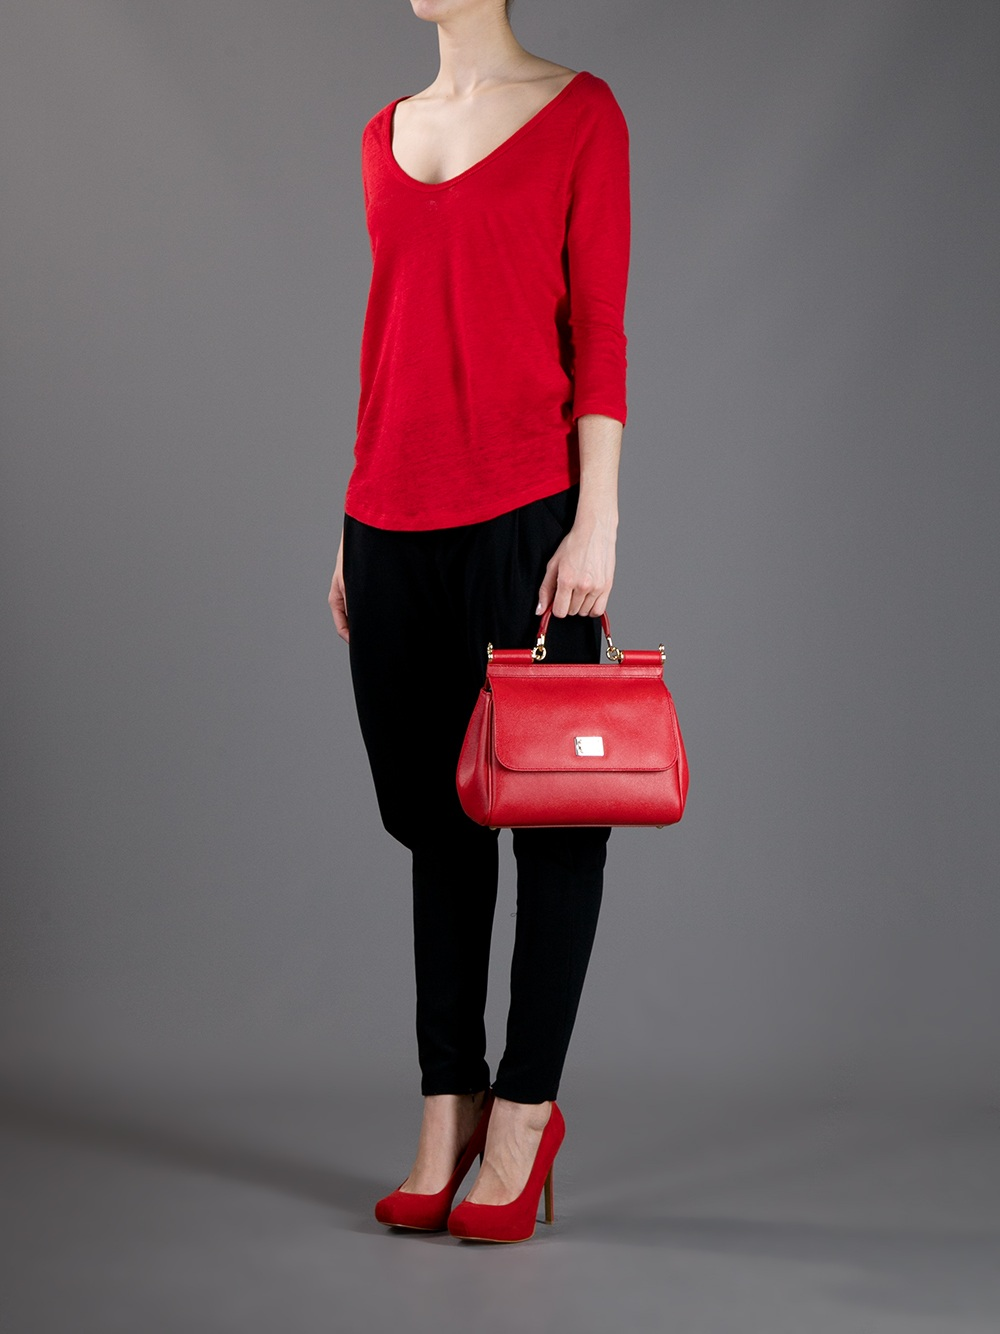 Calvin Klein Women S Dresses